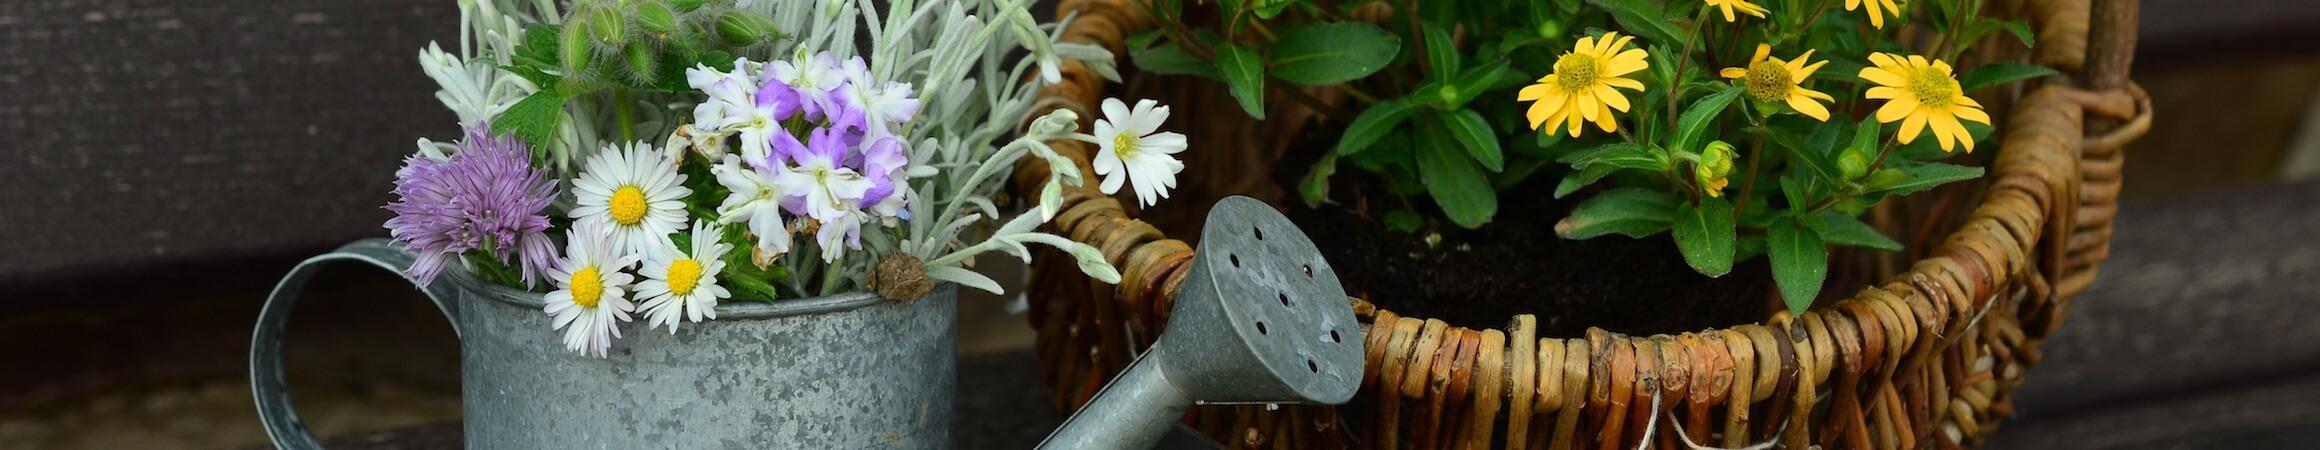 Gardening 06